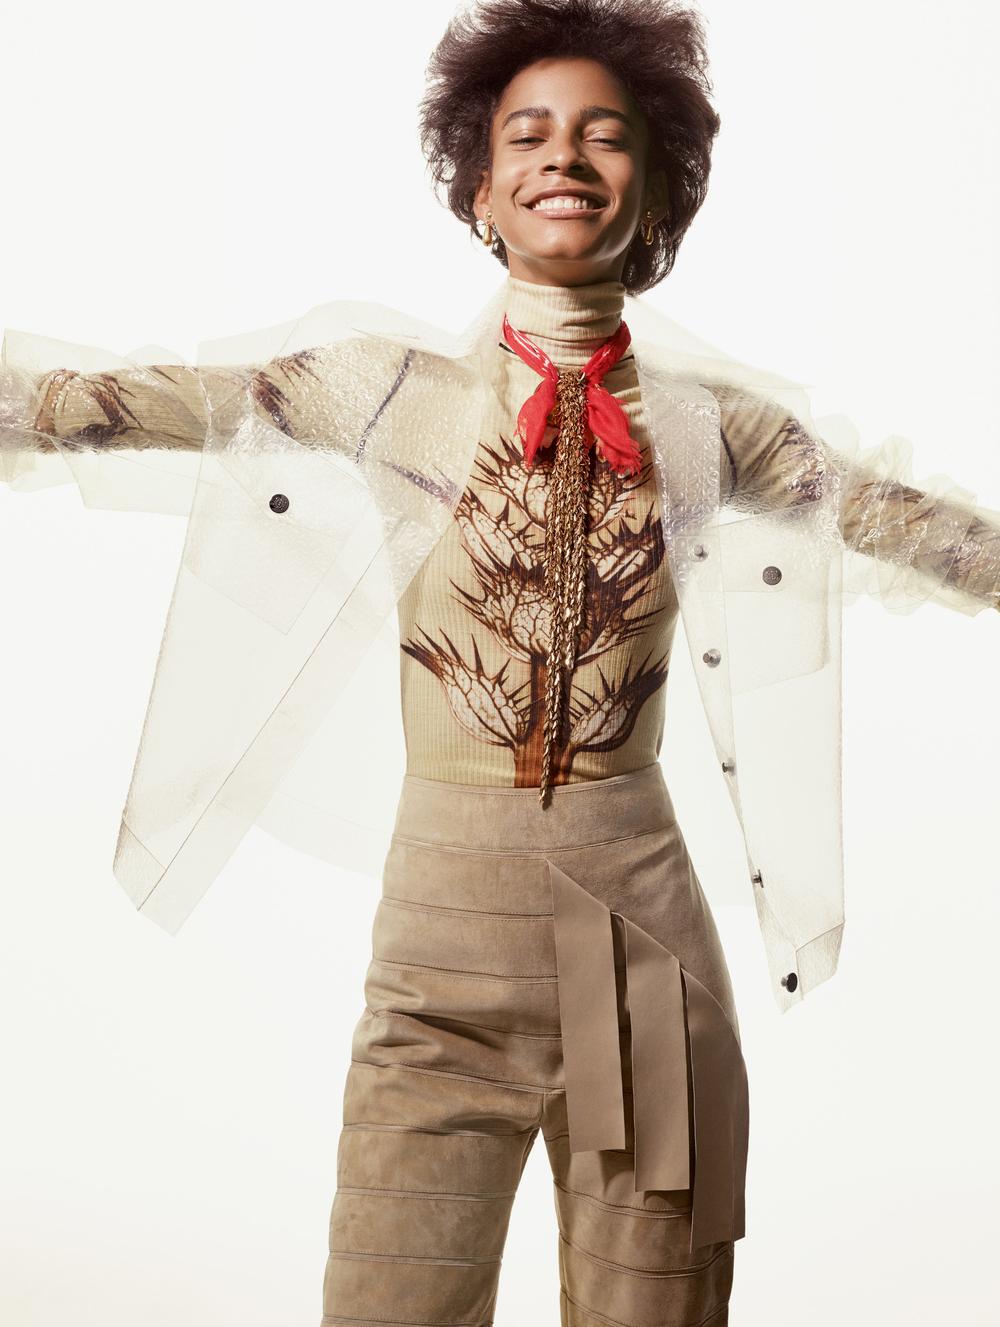 Chaqueta, blusa, pantalón y brazalete (usado como collar), todo de  LOEWE , pañoleta de  TRUE RELIGION